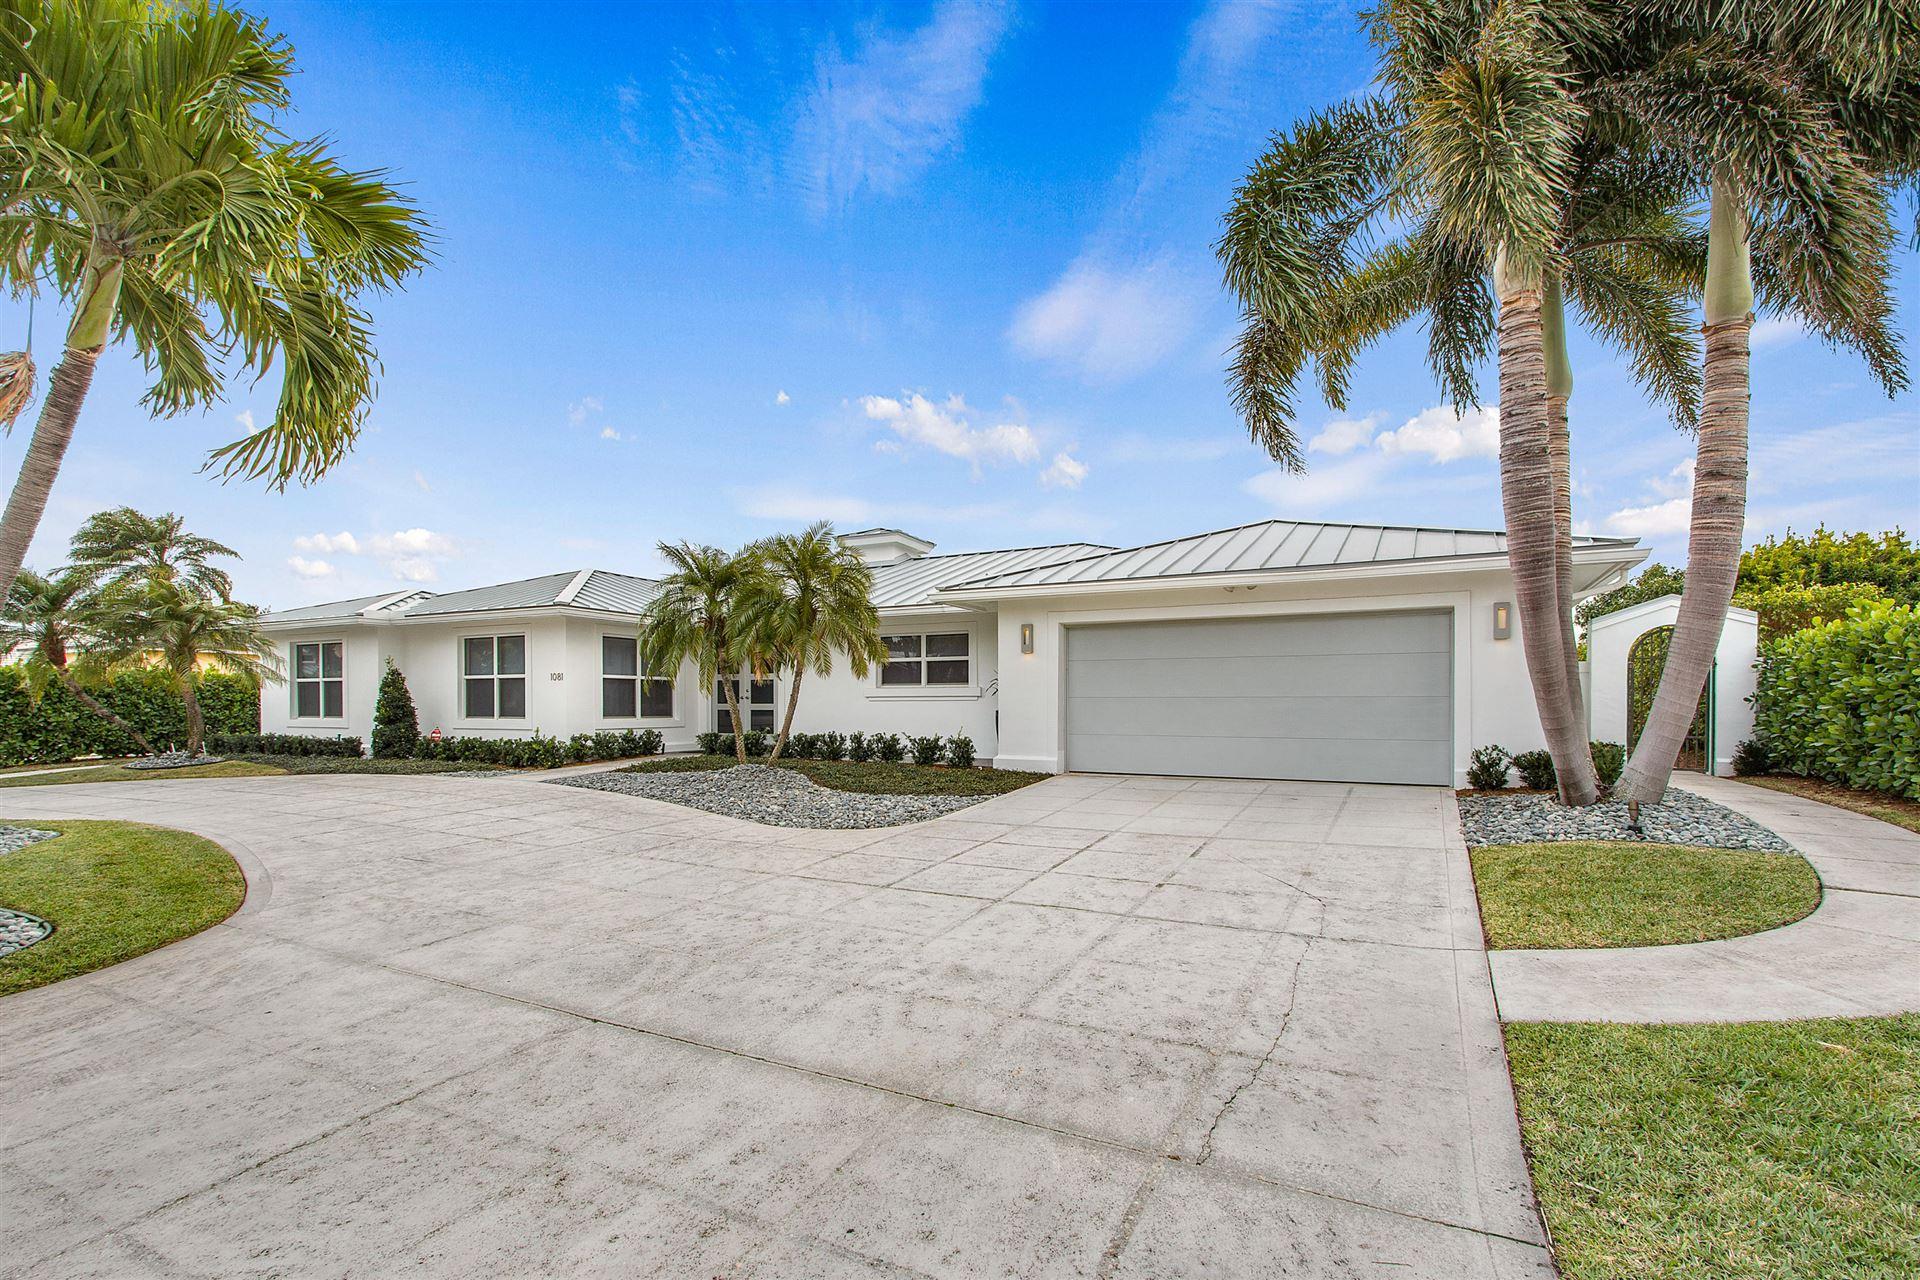 Photo of 1081 Fairview Lane, Singer Island, FL 33404 (MLS # RX-10656157)